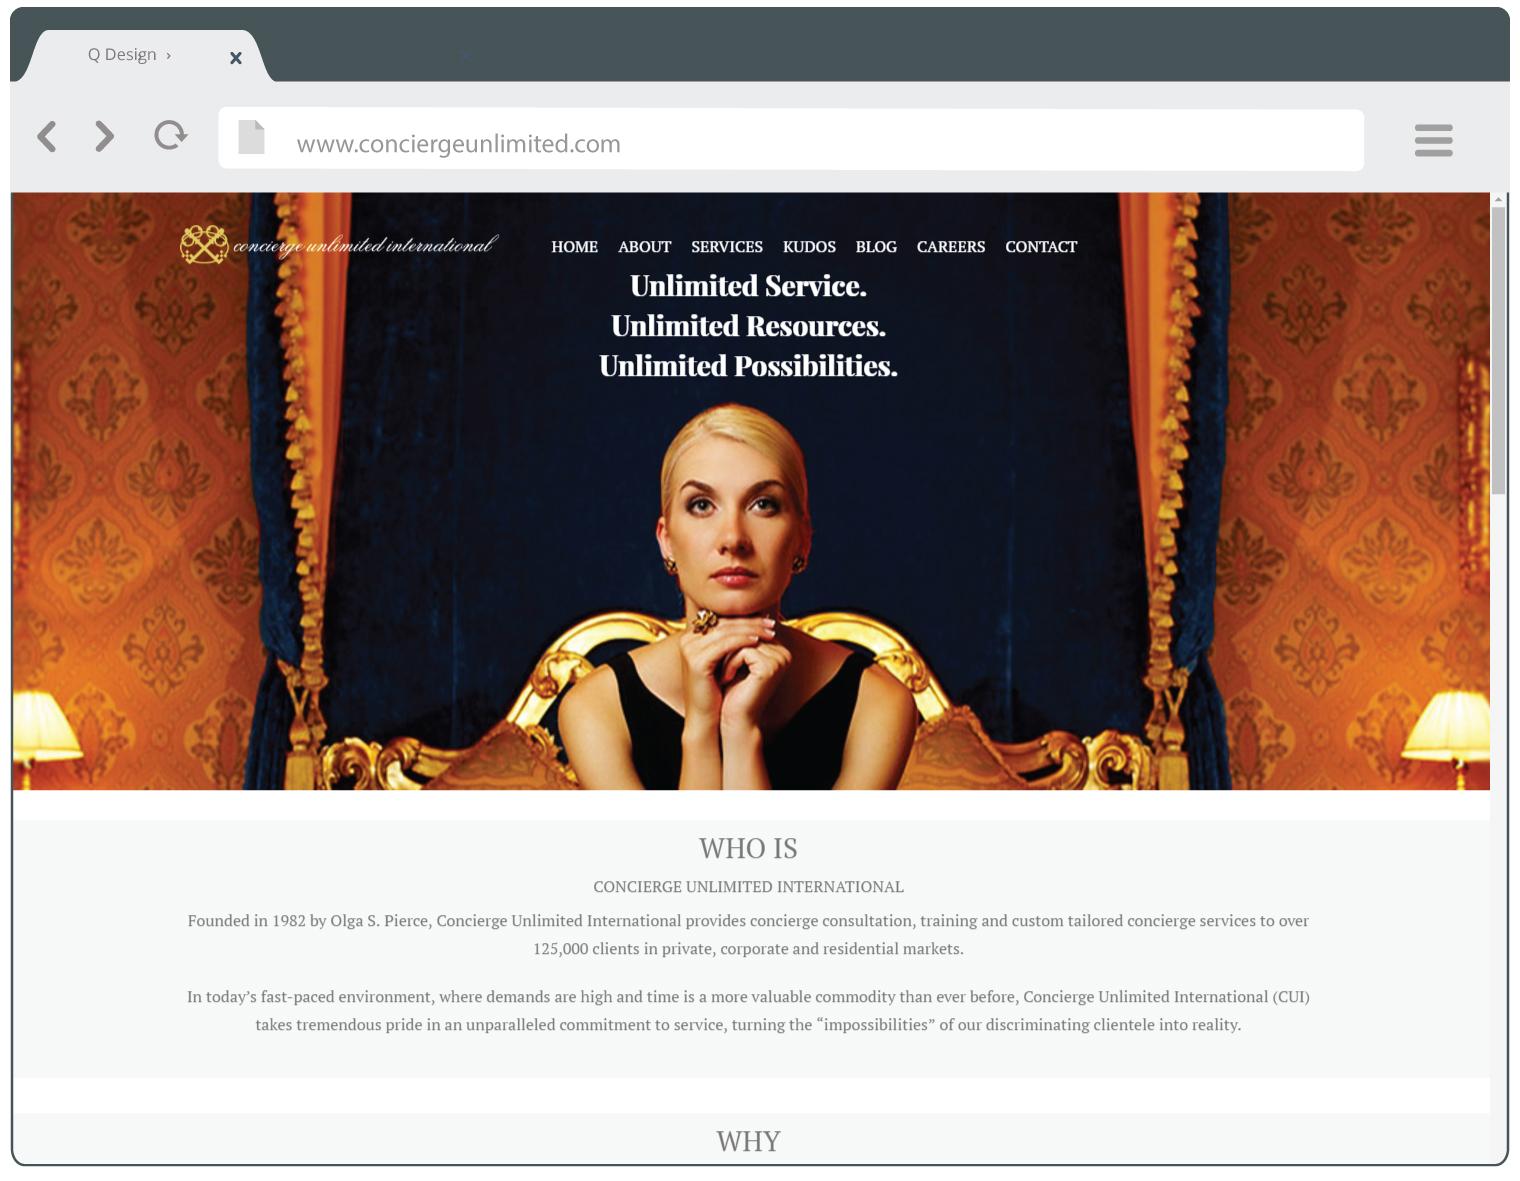 Concierge Unlimited website